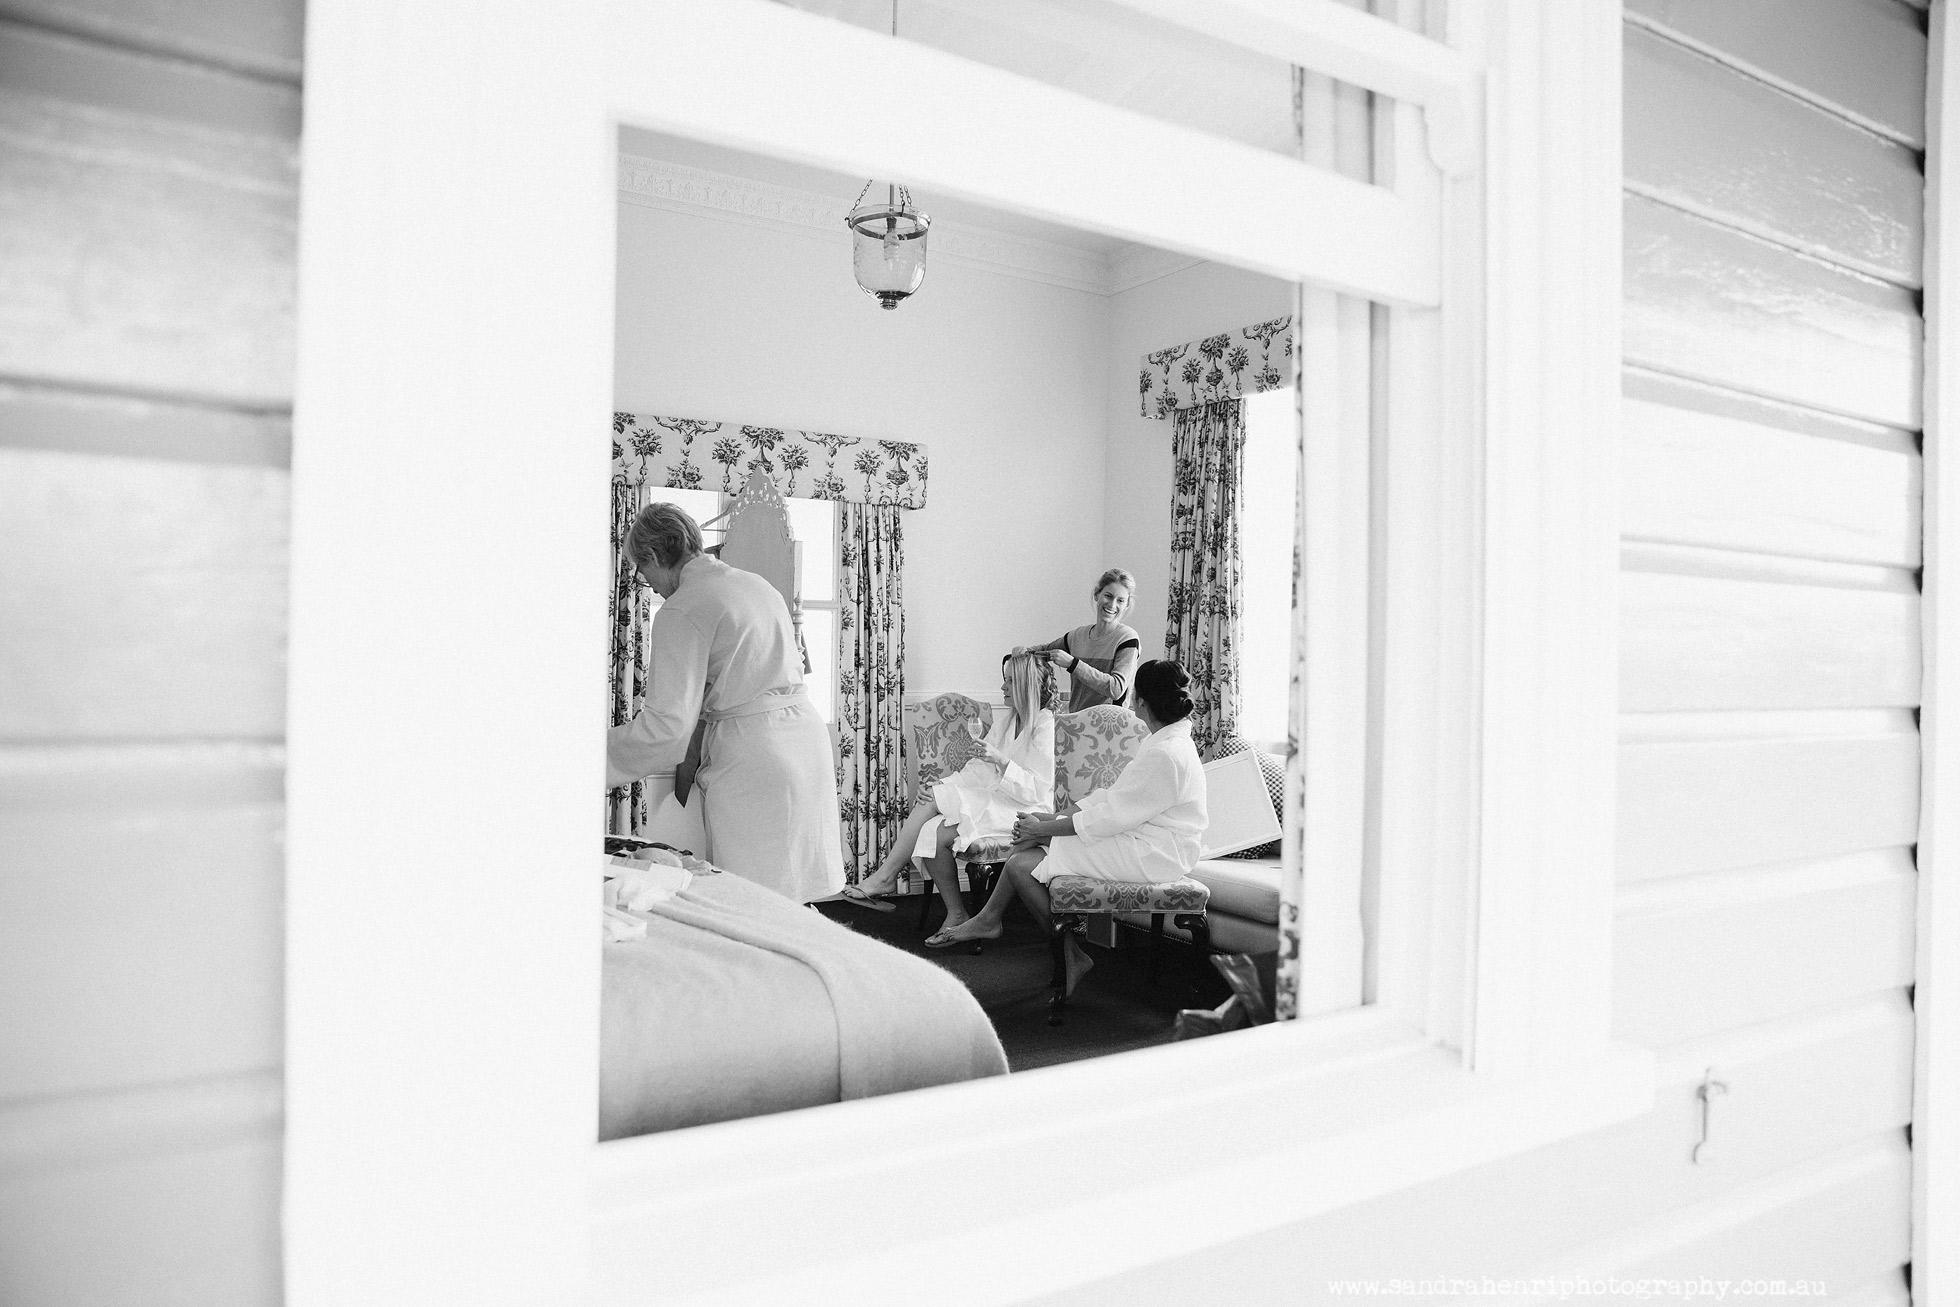 Roberts-Restaurant-garden-wedding-images-2.jpg